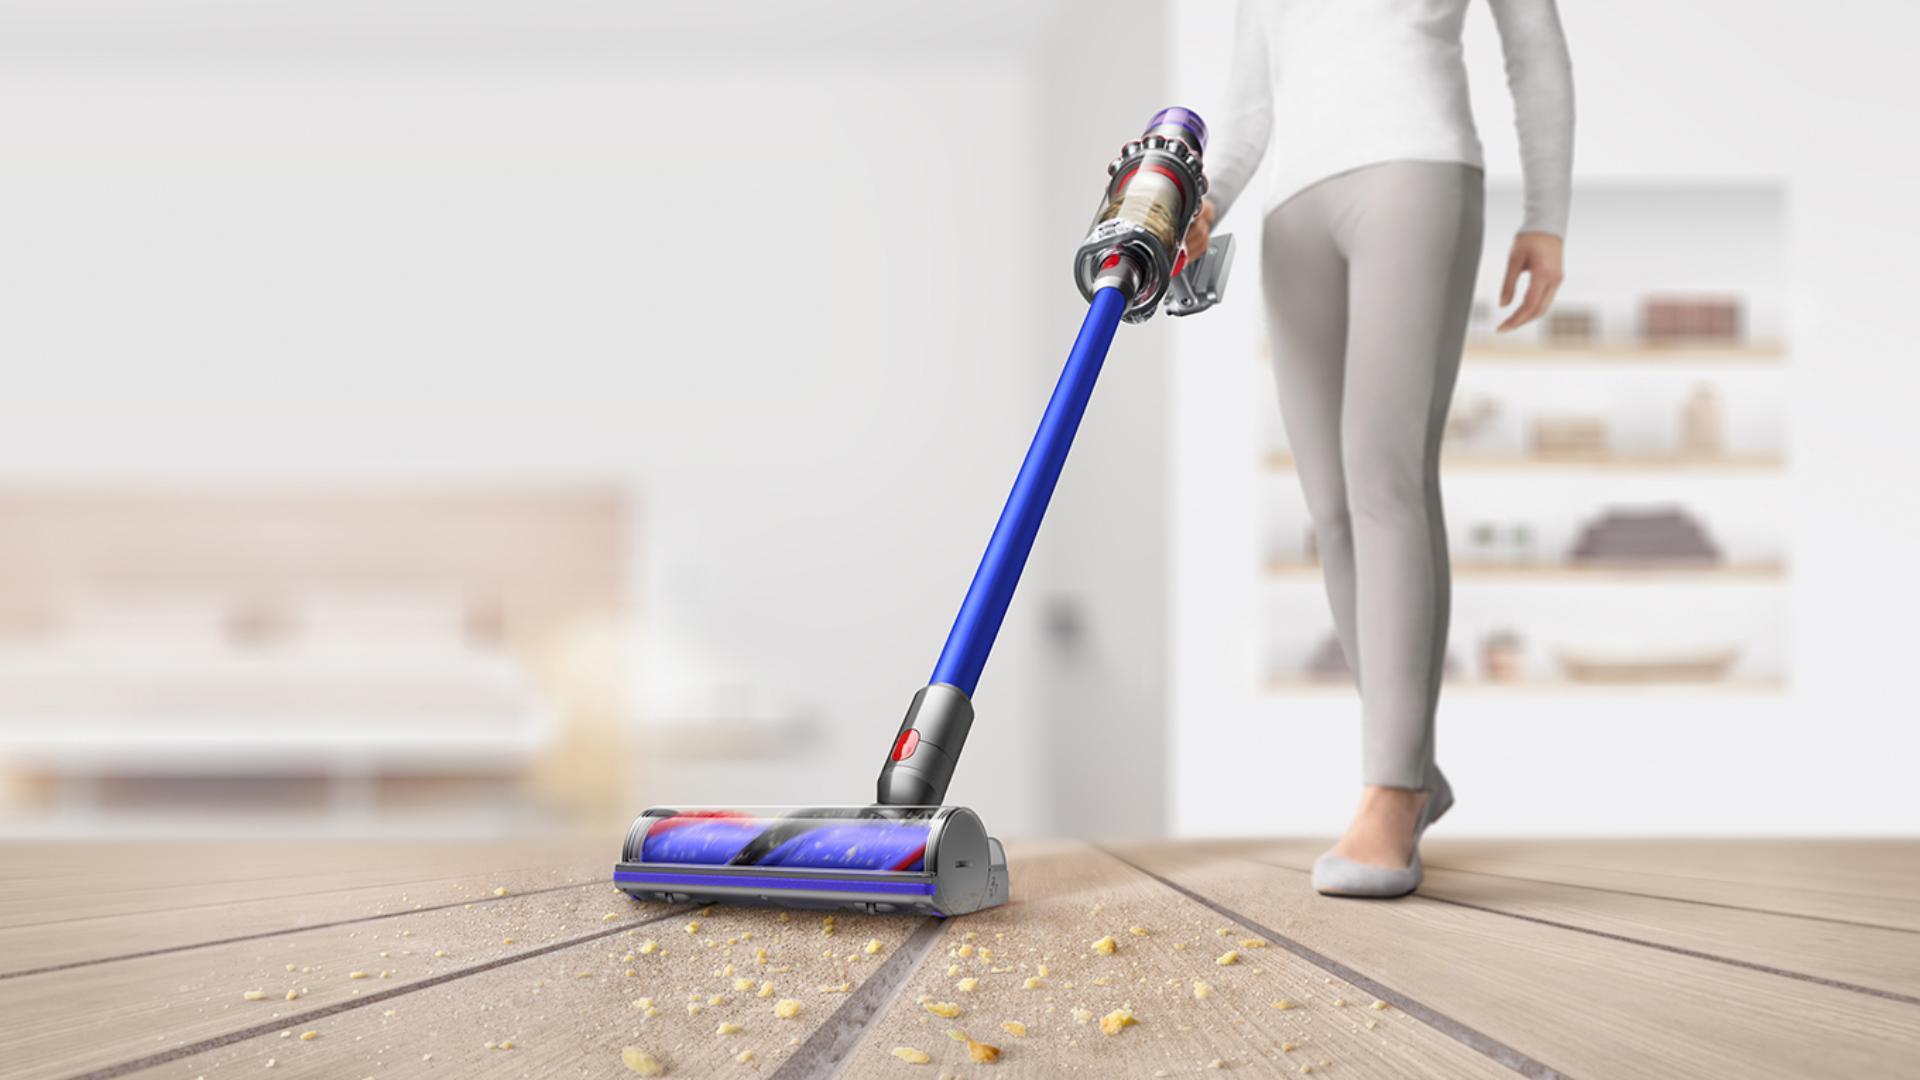 Dyson 11 vacuuming up dirt